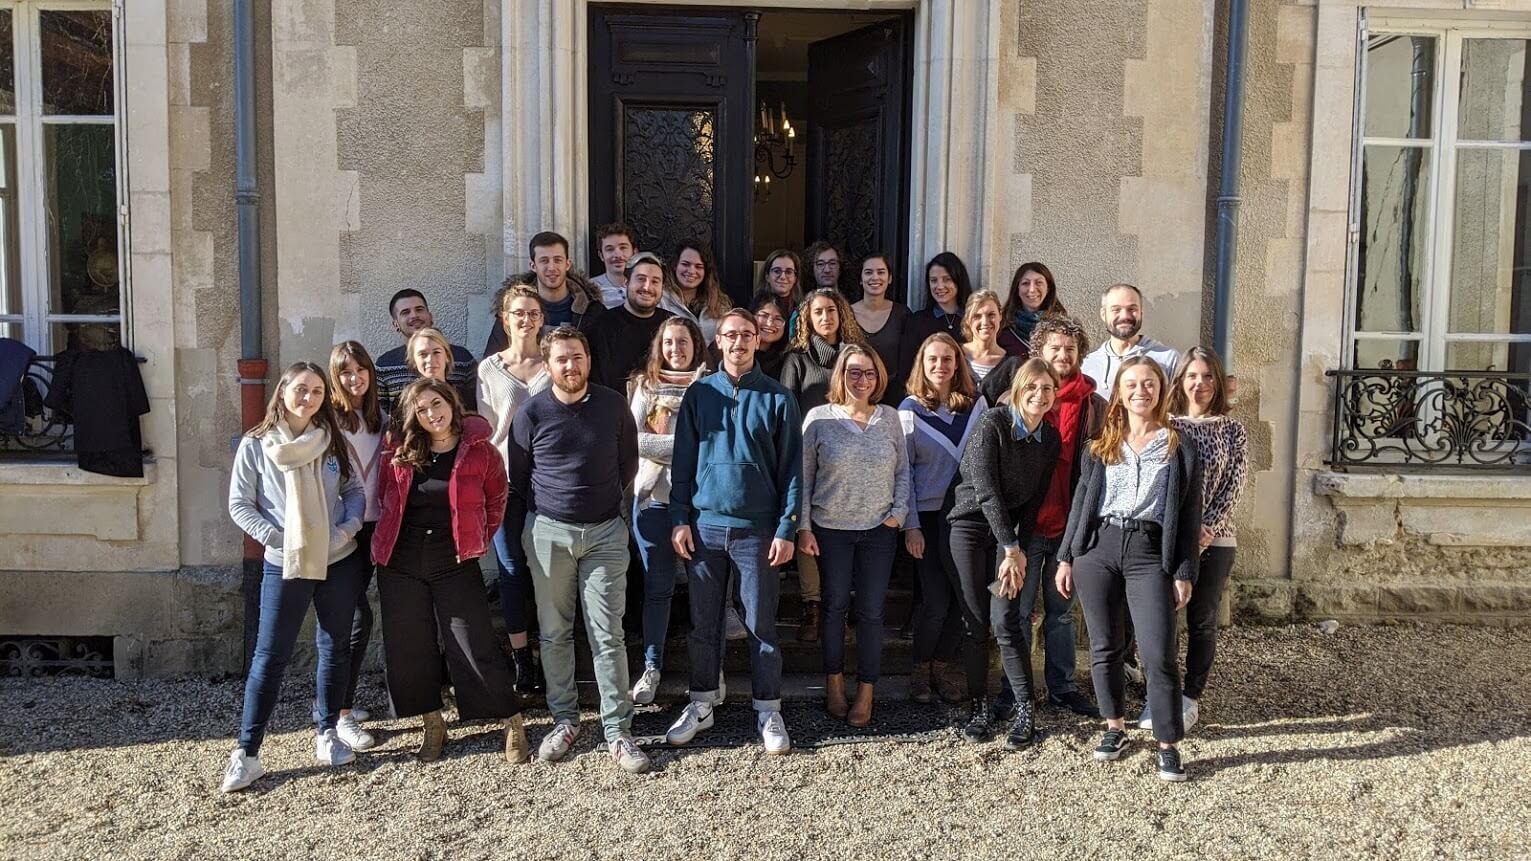 Séminaires Invox : Morlet en 2020